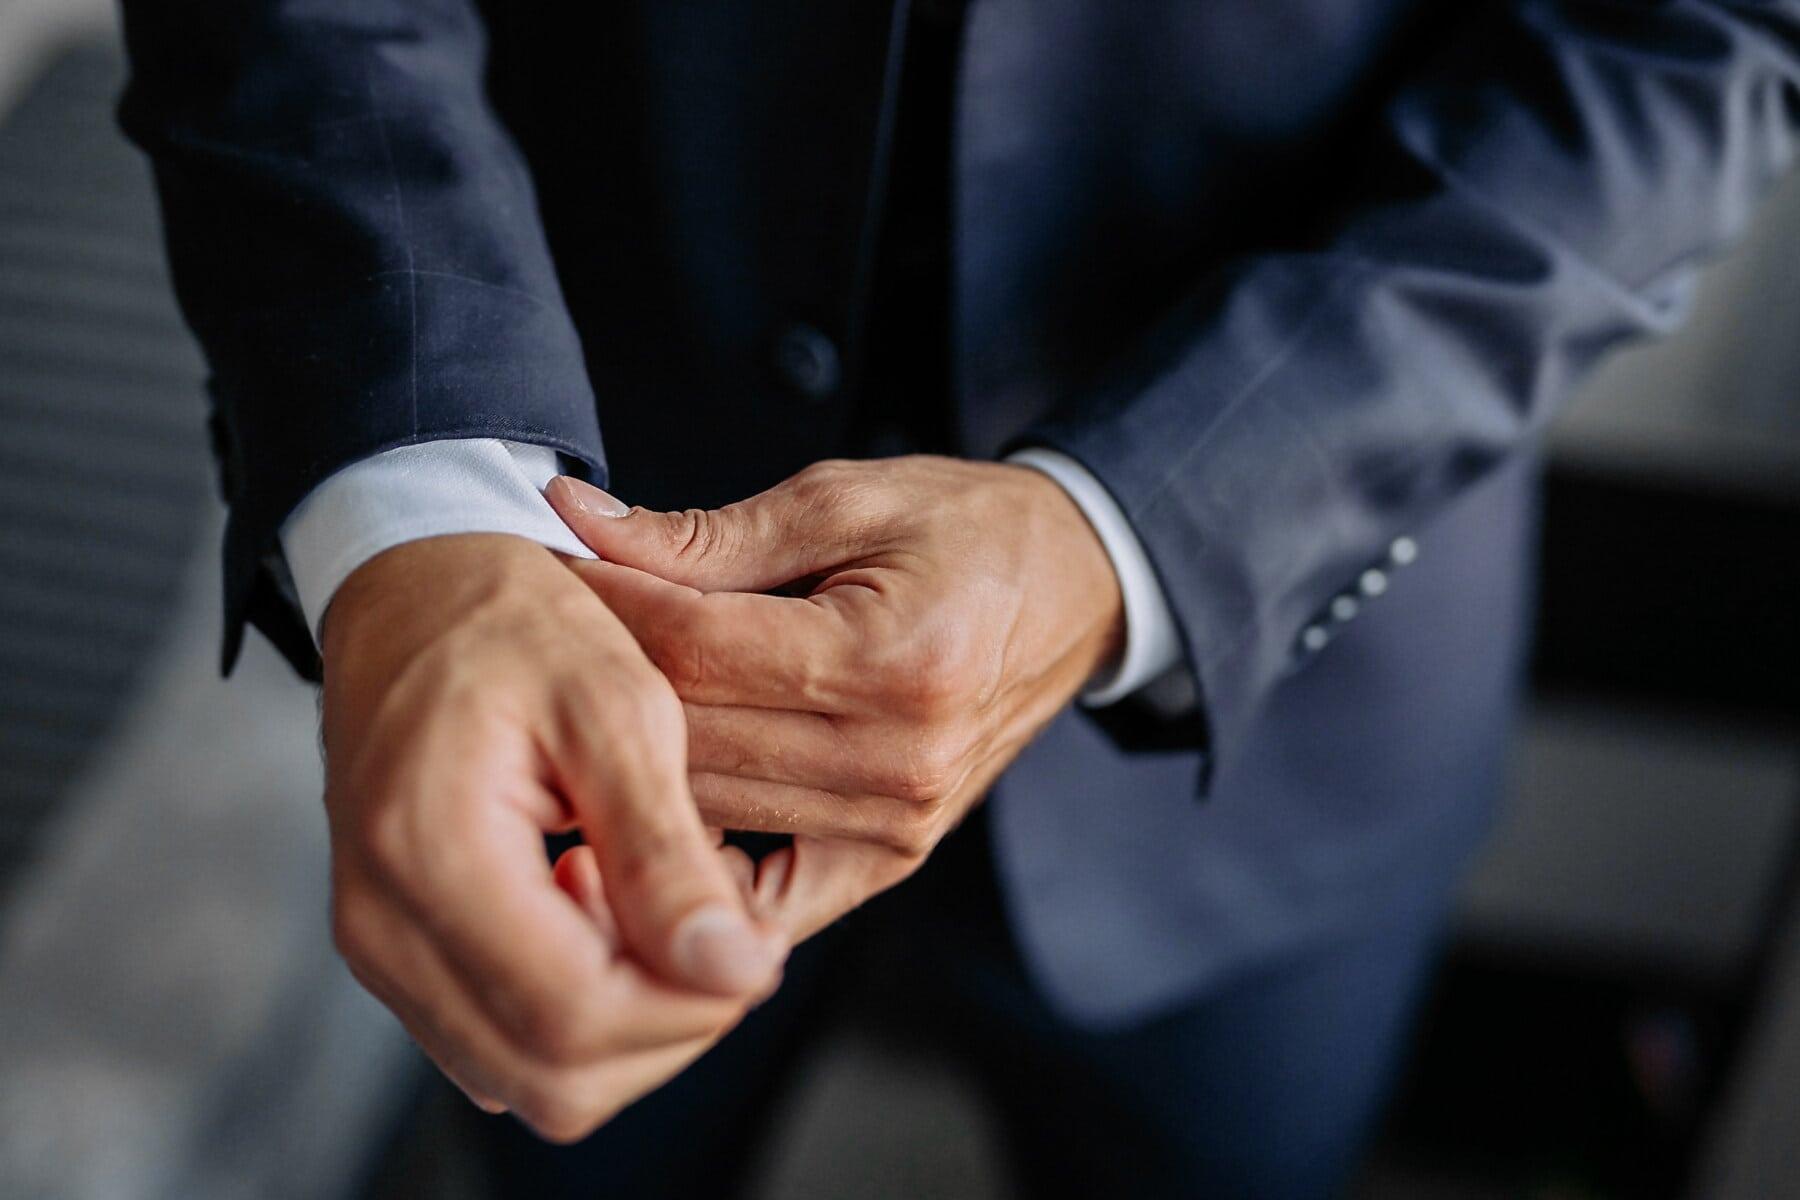 tuxedo suit, hand, holding hands, businessman, jacket, shirt, hands, man, people, business